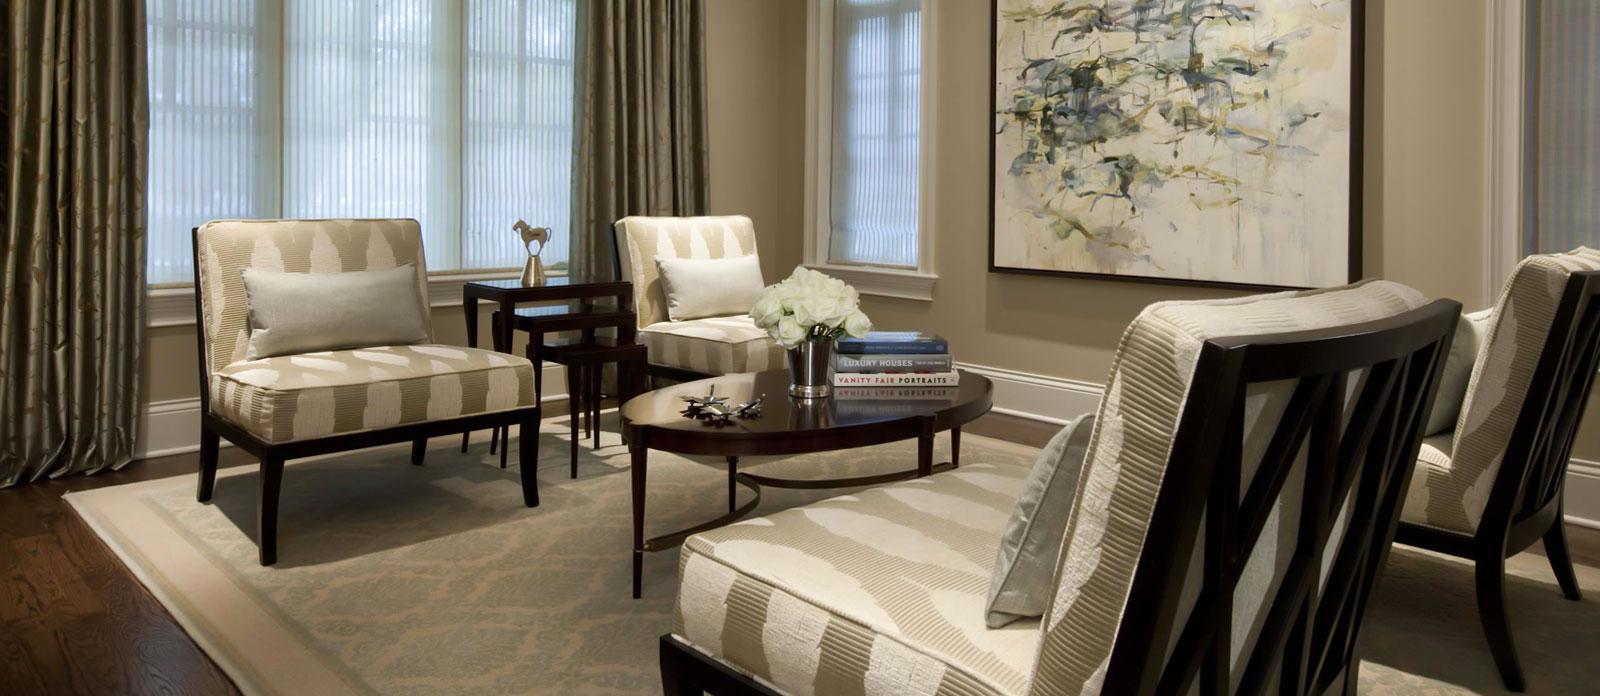 decorasion rang bej14 - رنگ بژ در دکوراسیون داخلی